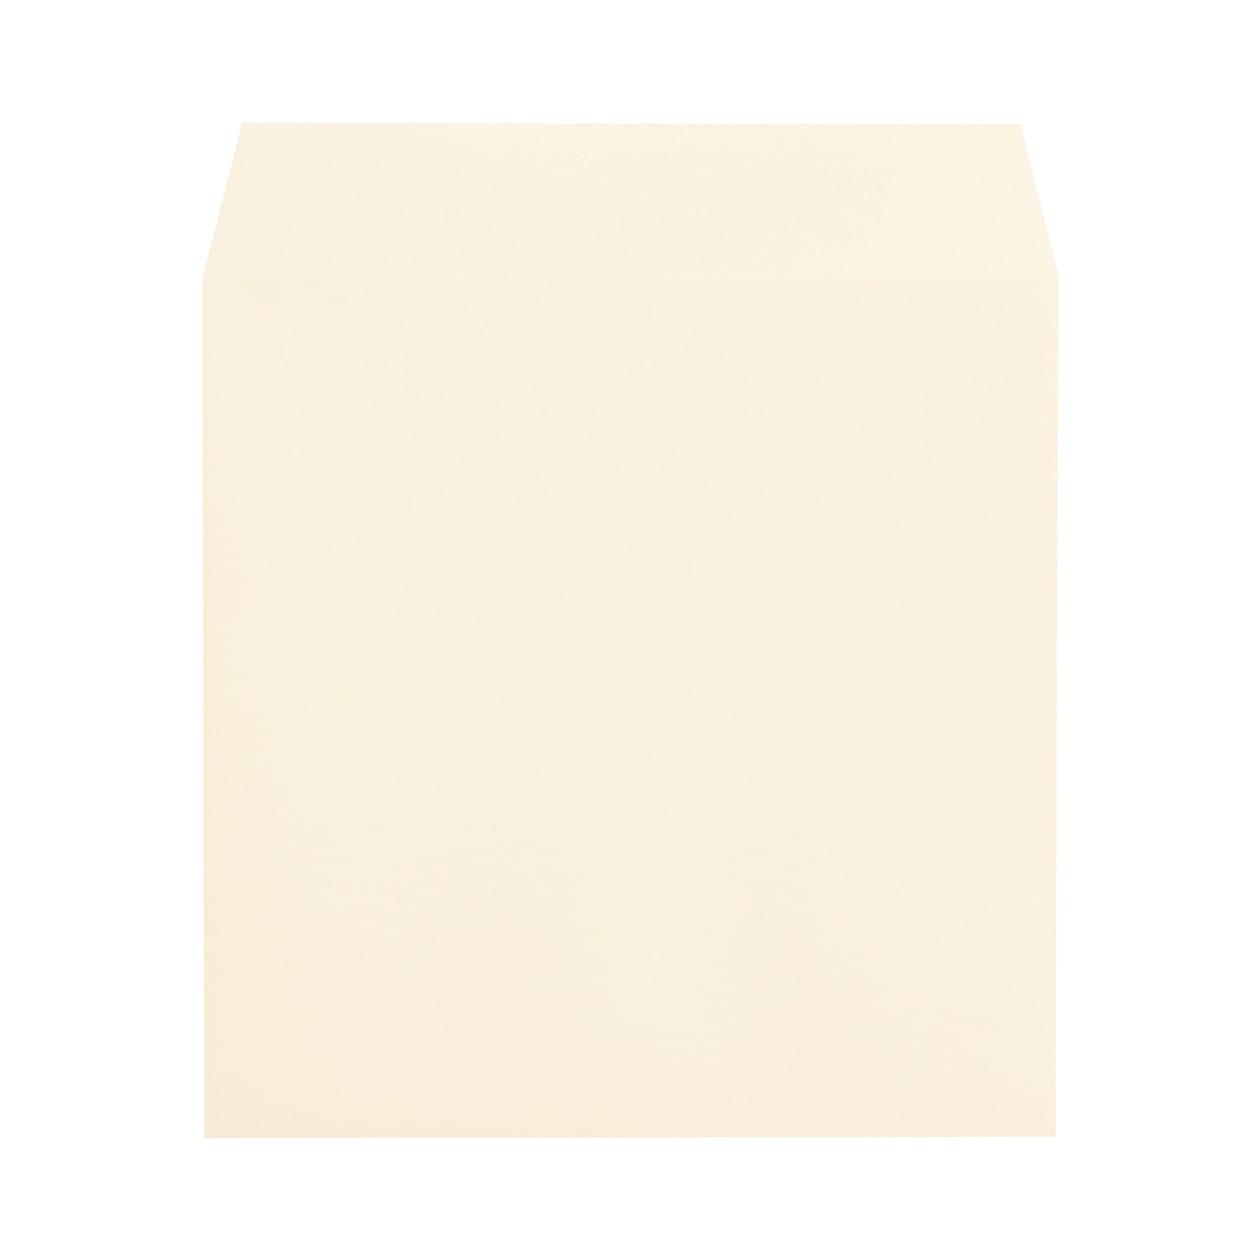 SE22封筒 コットン ナチュラル 116.3g